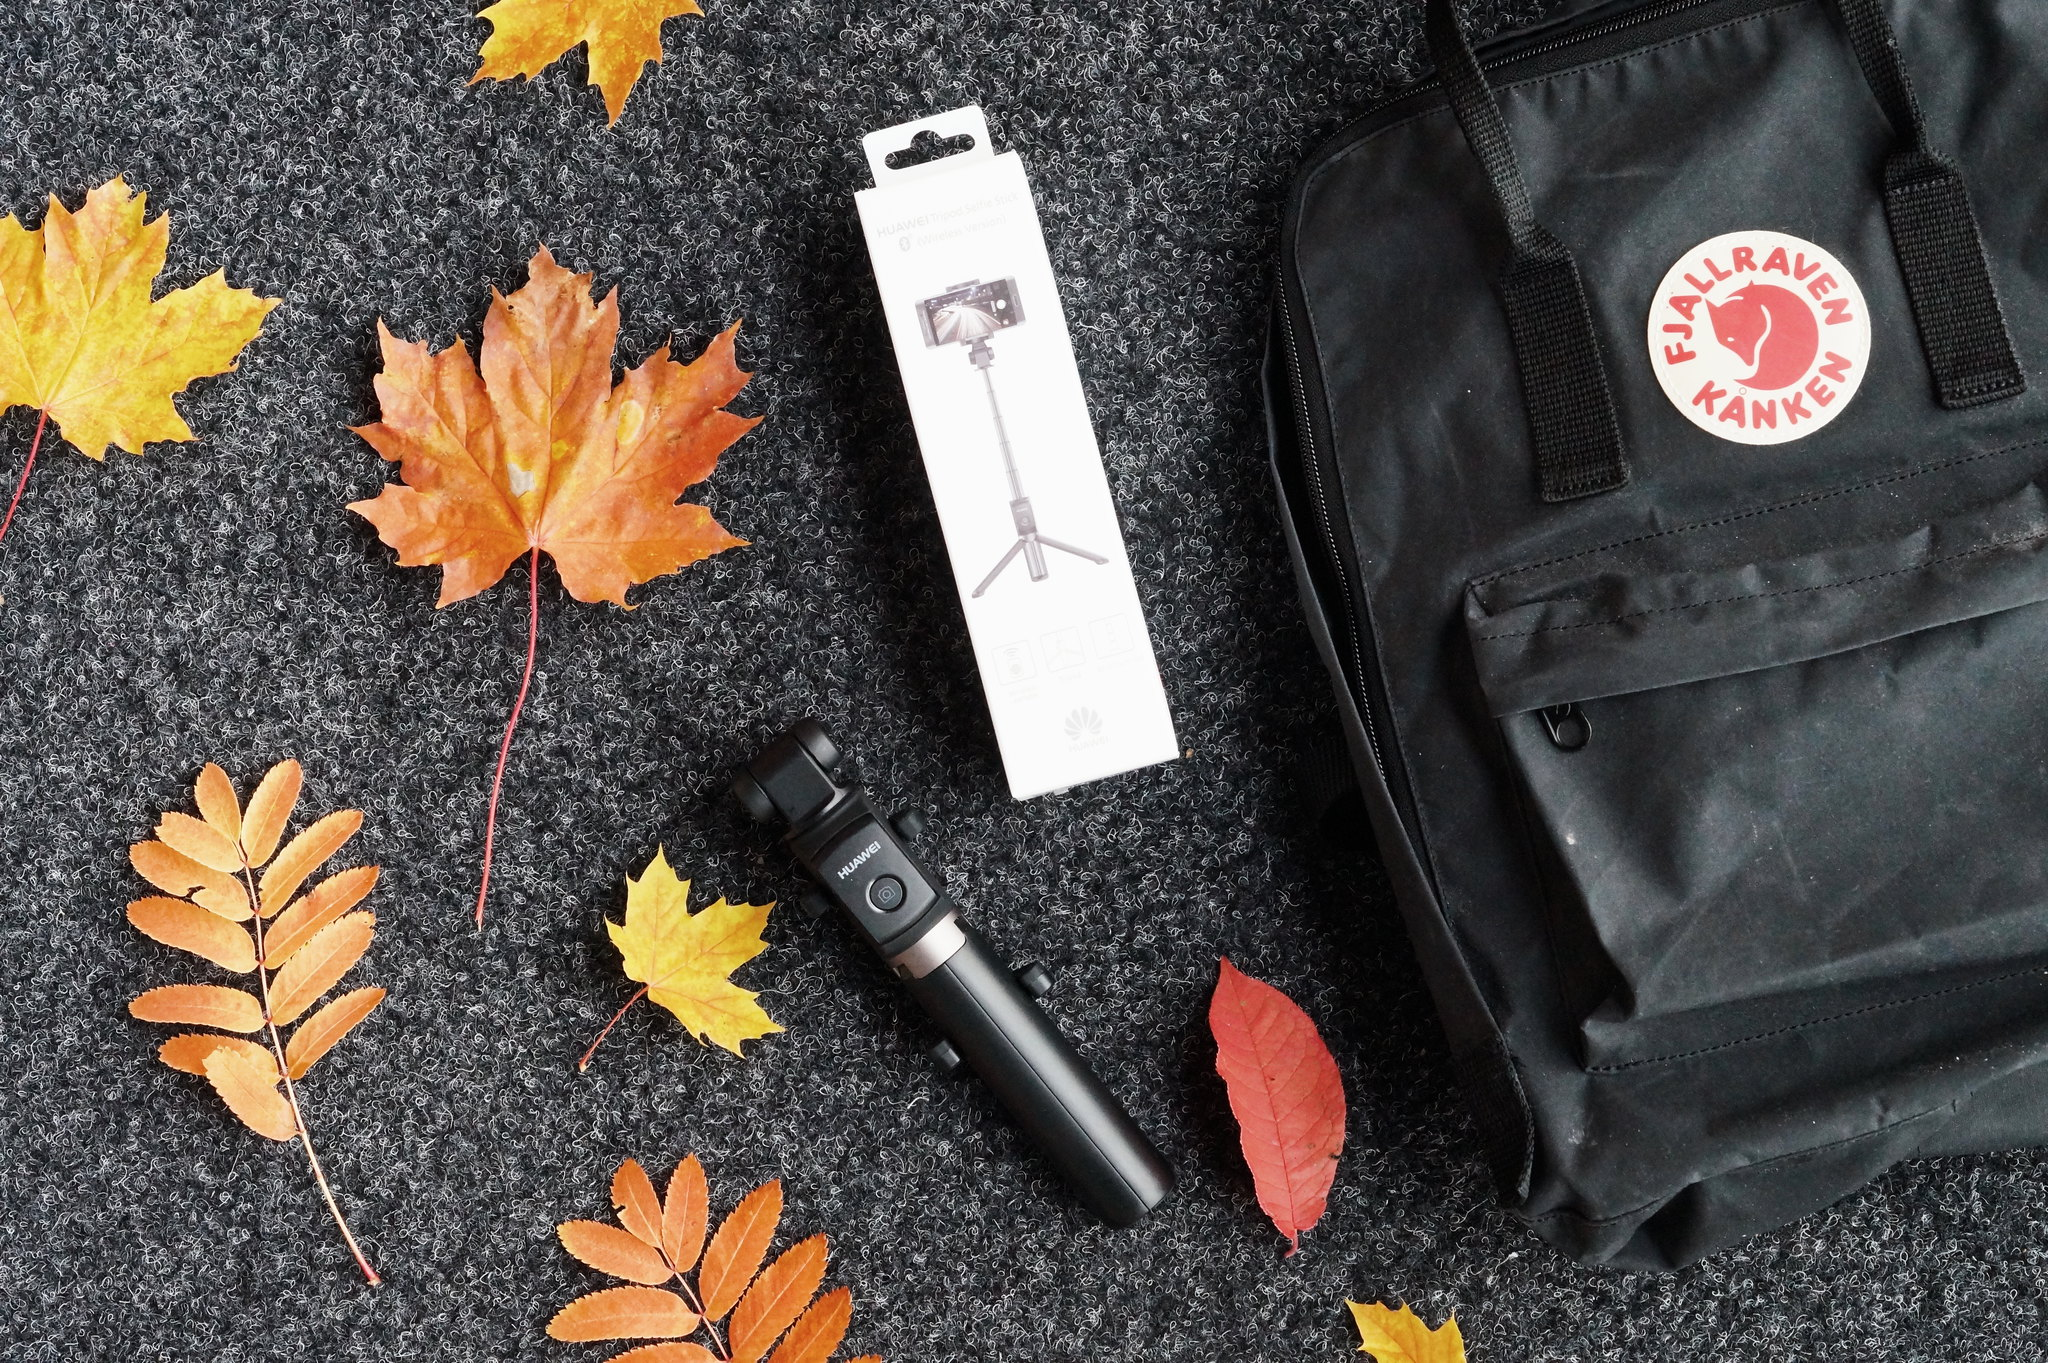 Huawei-tripod-selfie-stick 1